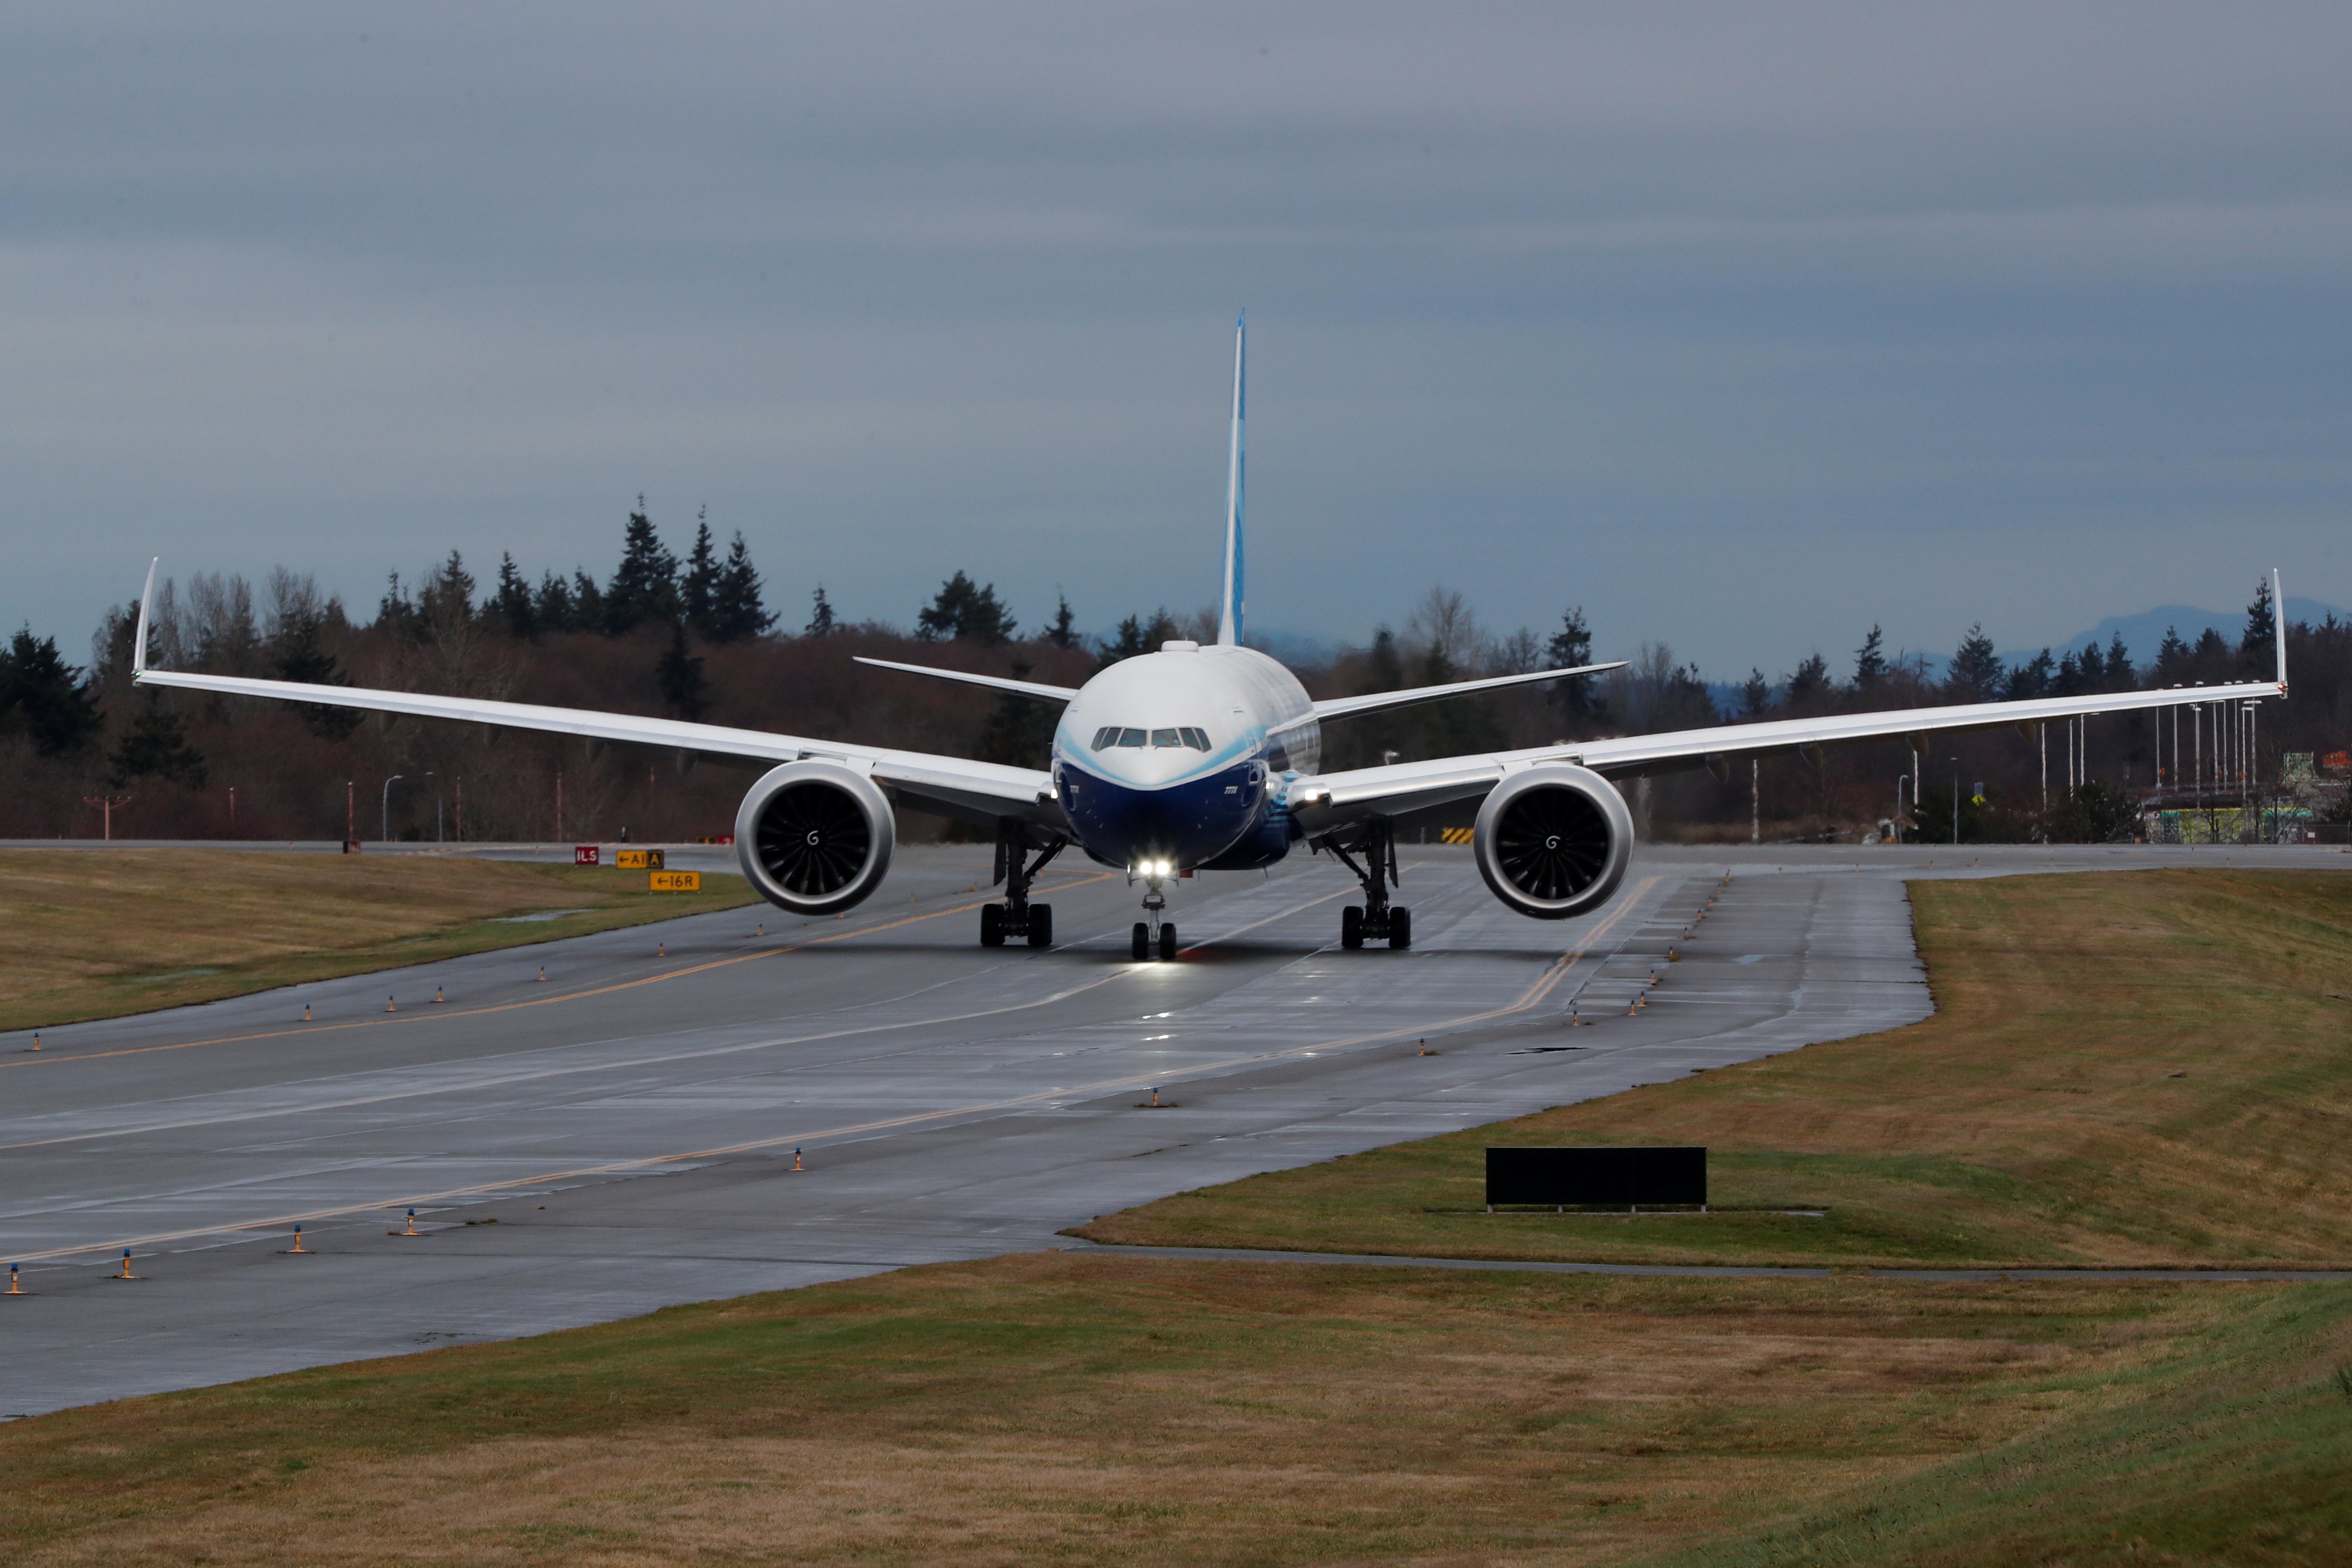 Boeing's 777X jetliner successfully completes maiden flight